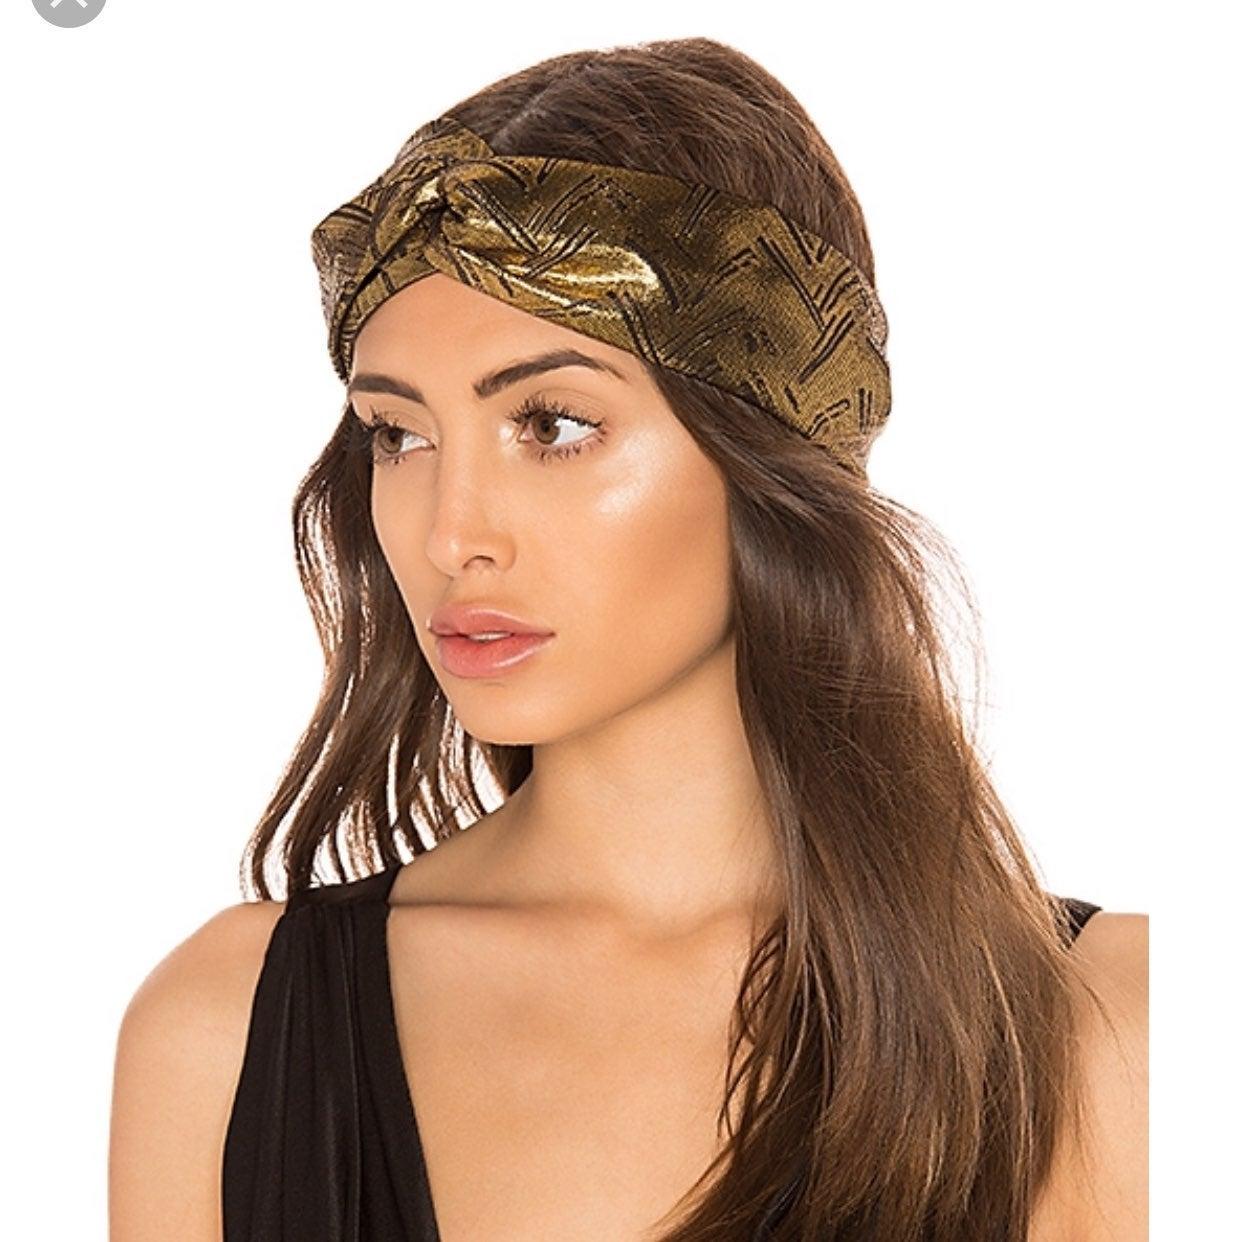 New! Super Cute Bronze Turban Headband